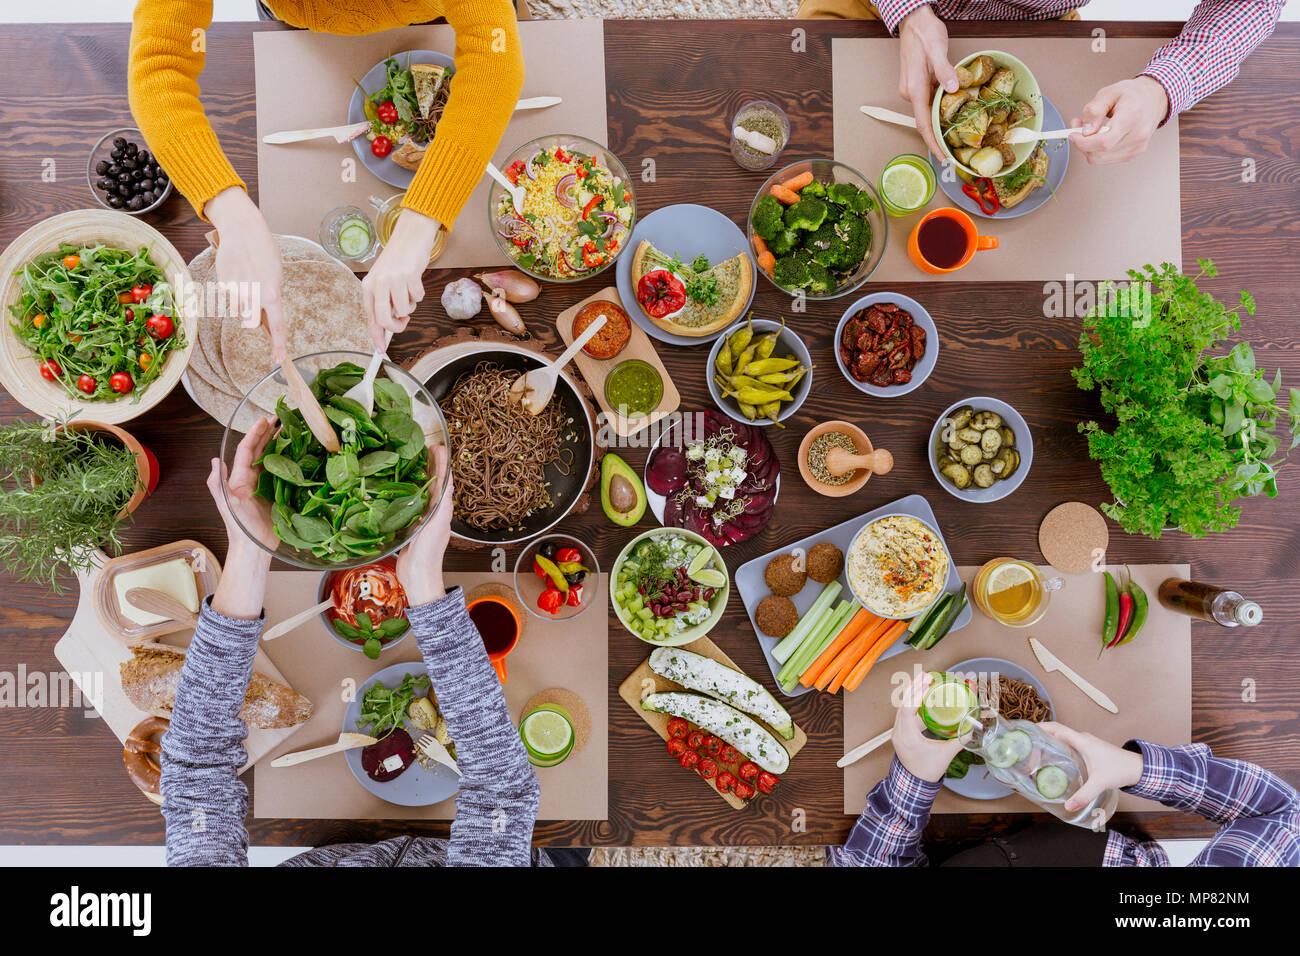 Various vegetarian food lying on rustic wooden table - Stock Image